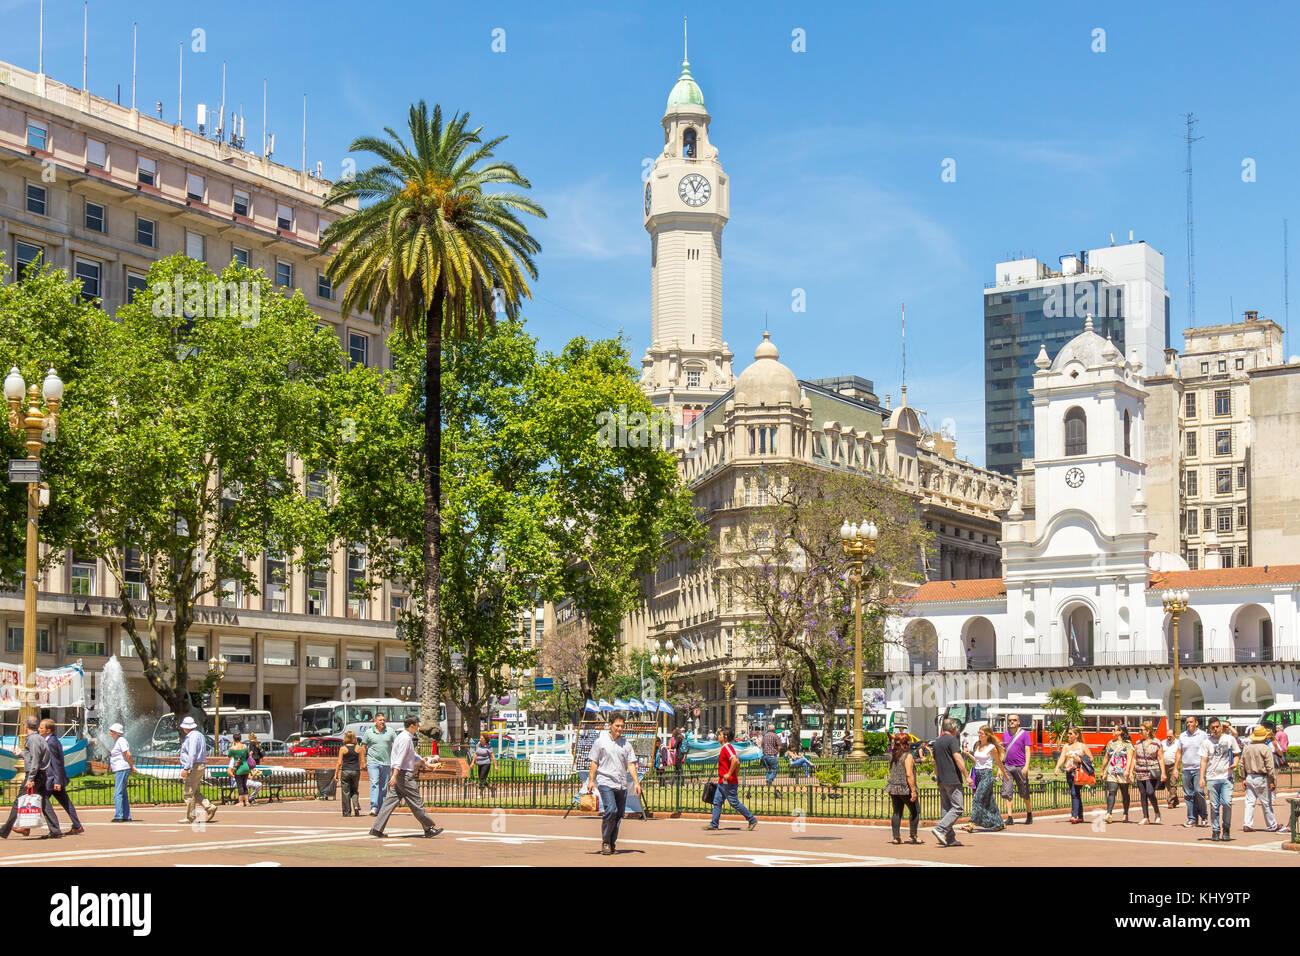 Plaza de Mayo | Buenos Aires | Argentina Imagen De Stock